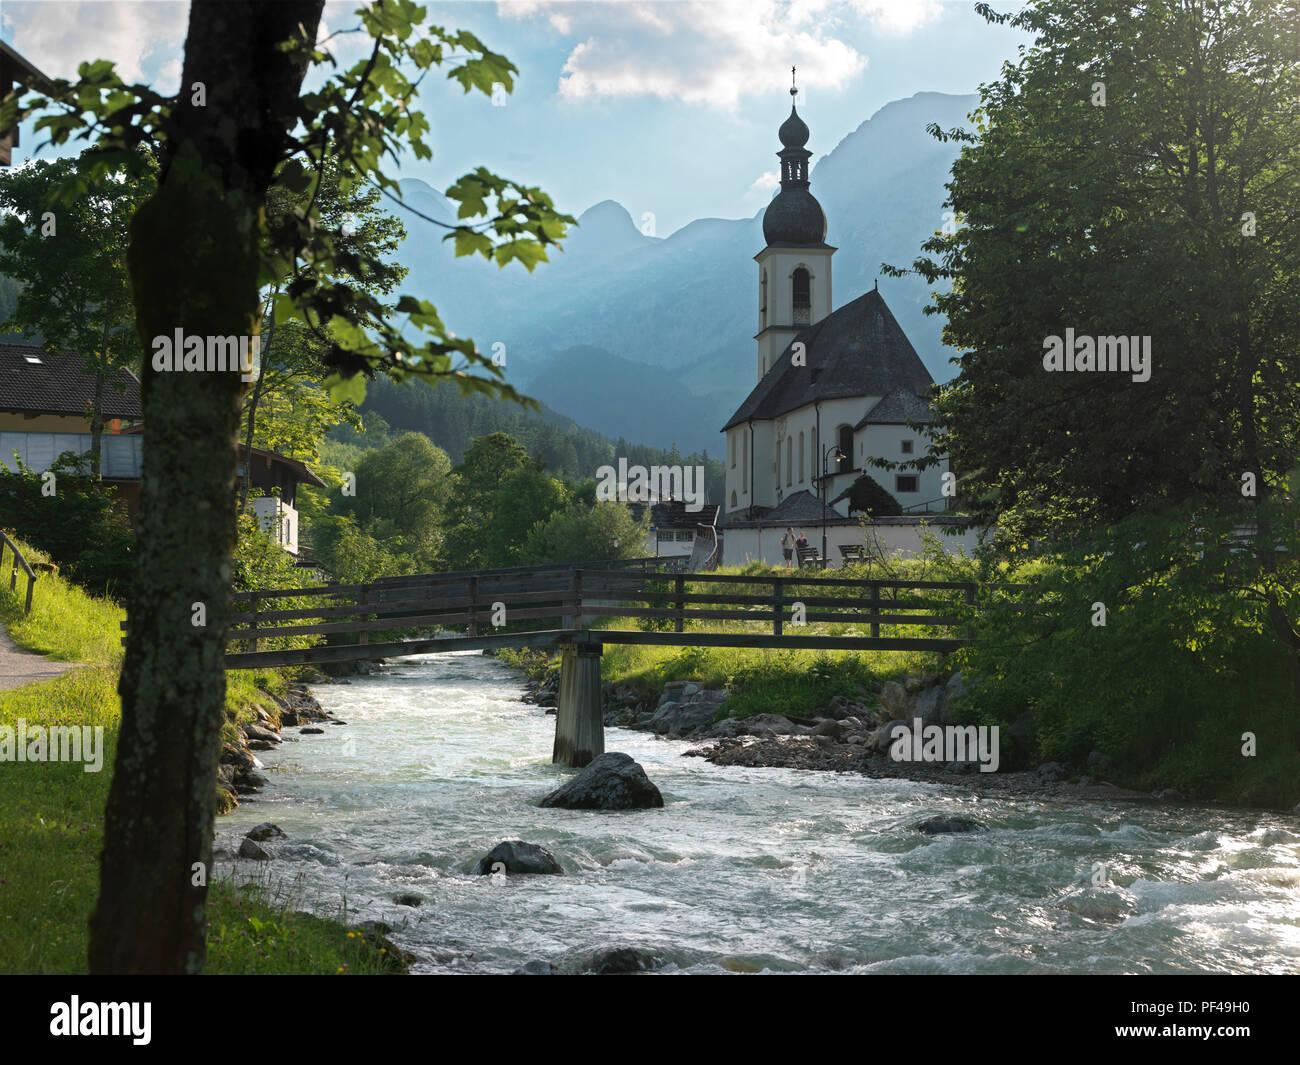 Pfarrkirche St. Sebastian, Ramsauer Ache, HG Reiteralpe, Ramsau, Berchtesgadener Land, Oberbayern, Bayern, Deutsland | Bavaria, Germany Stock Photo